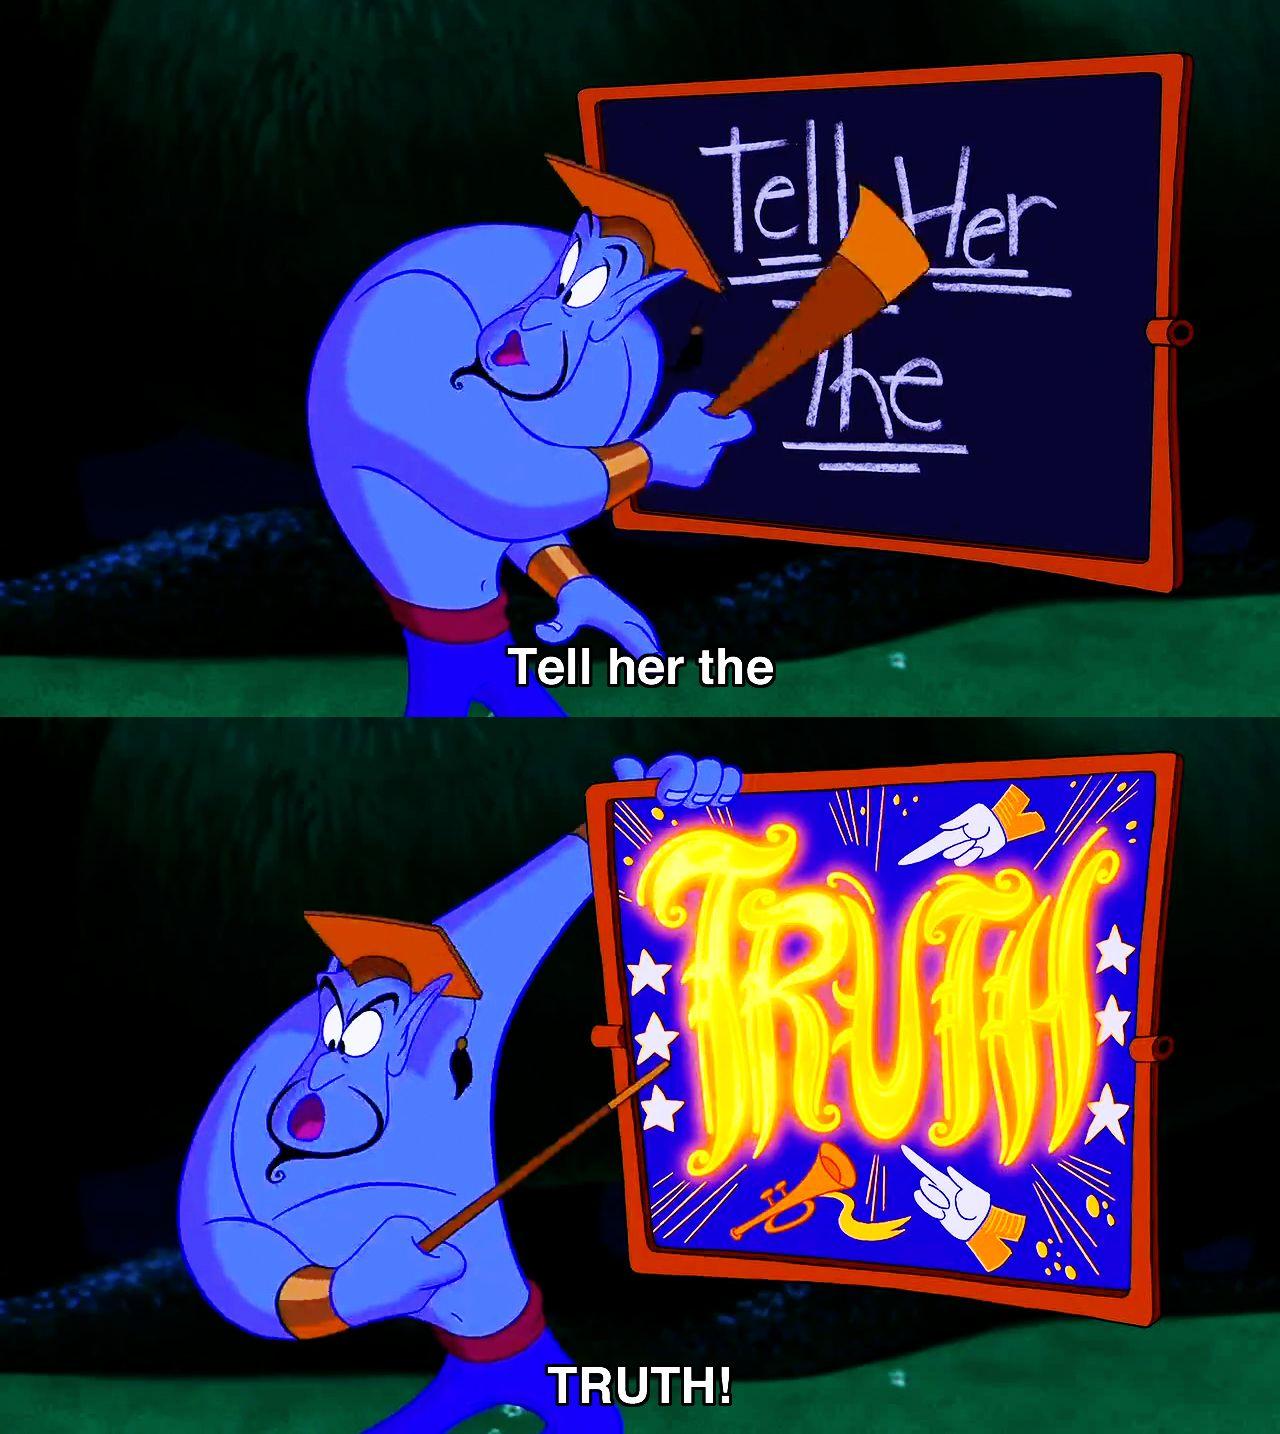 Its best to speak the truth | Aladdin | Pinterest | Truths, Disney ... for Genie Aladdin Quotes  104xkb